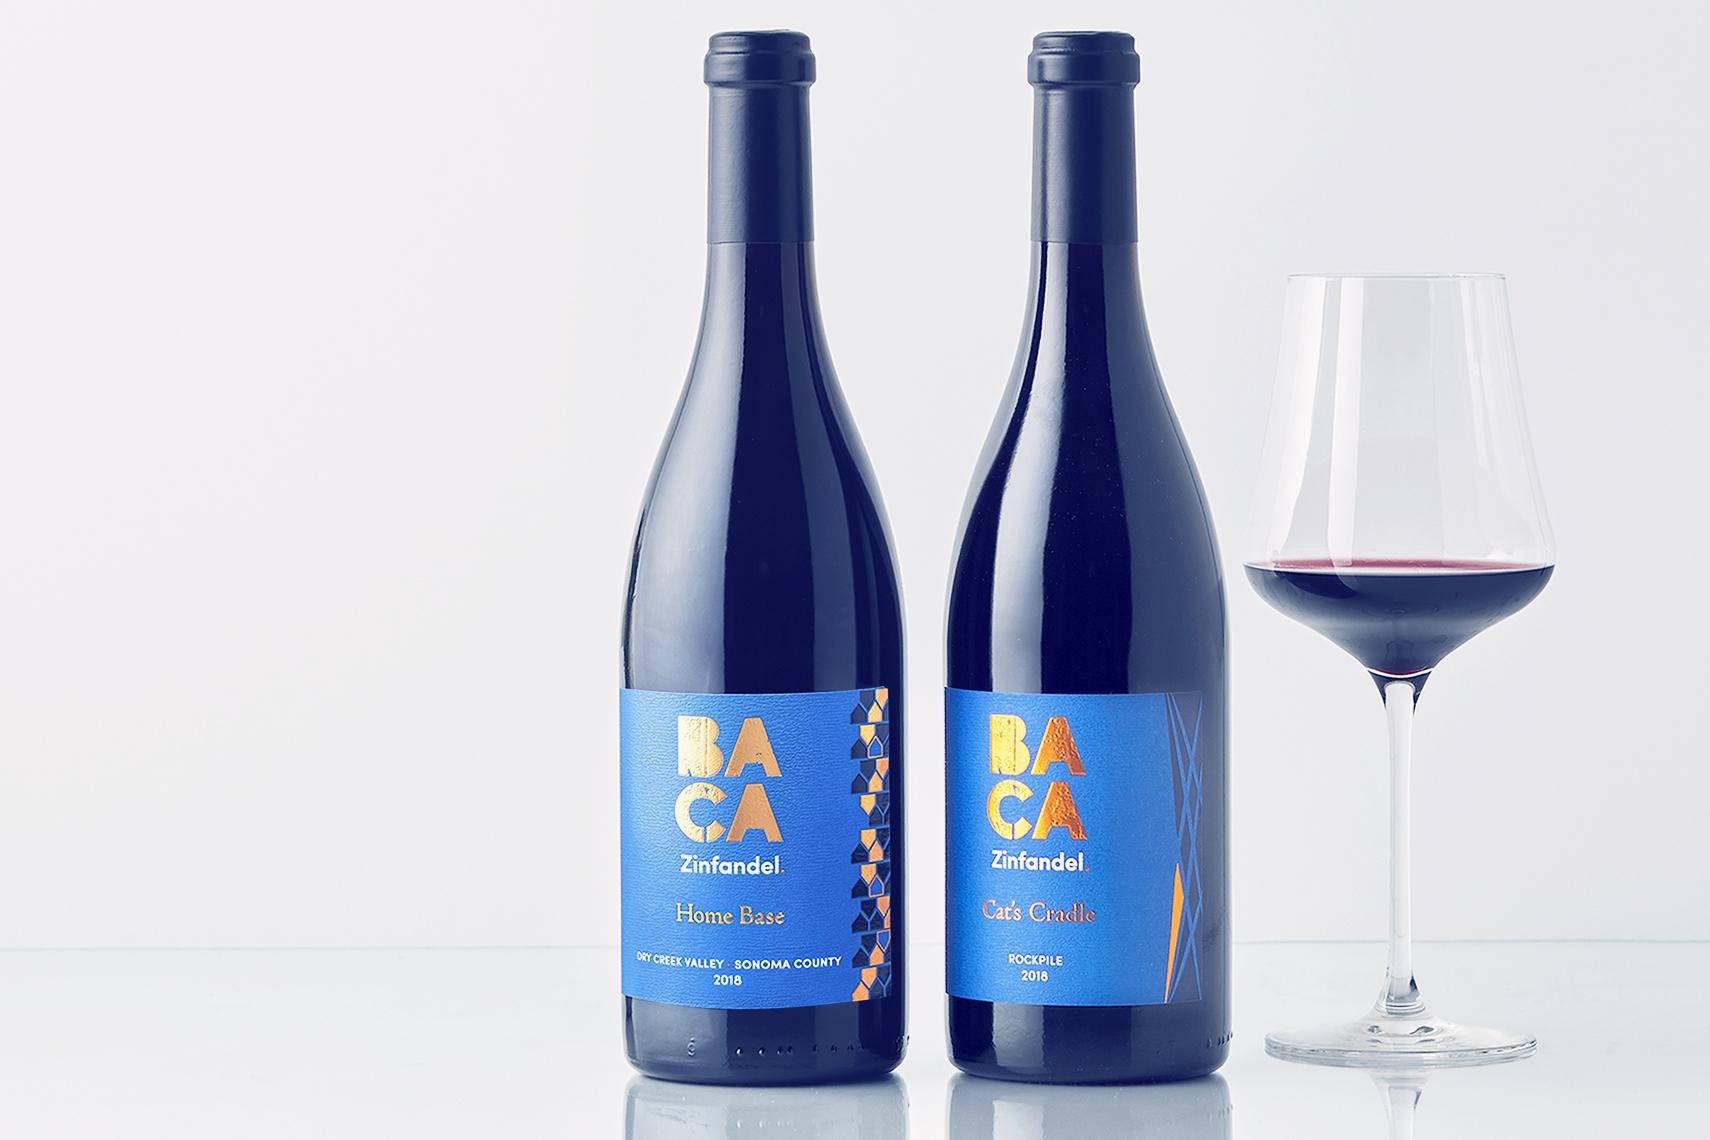 BACA Members 4th Quarter 2020 Club Shipment image of two bottles of BACA Zinfandel